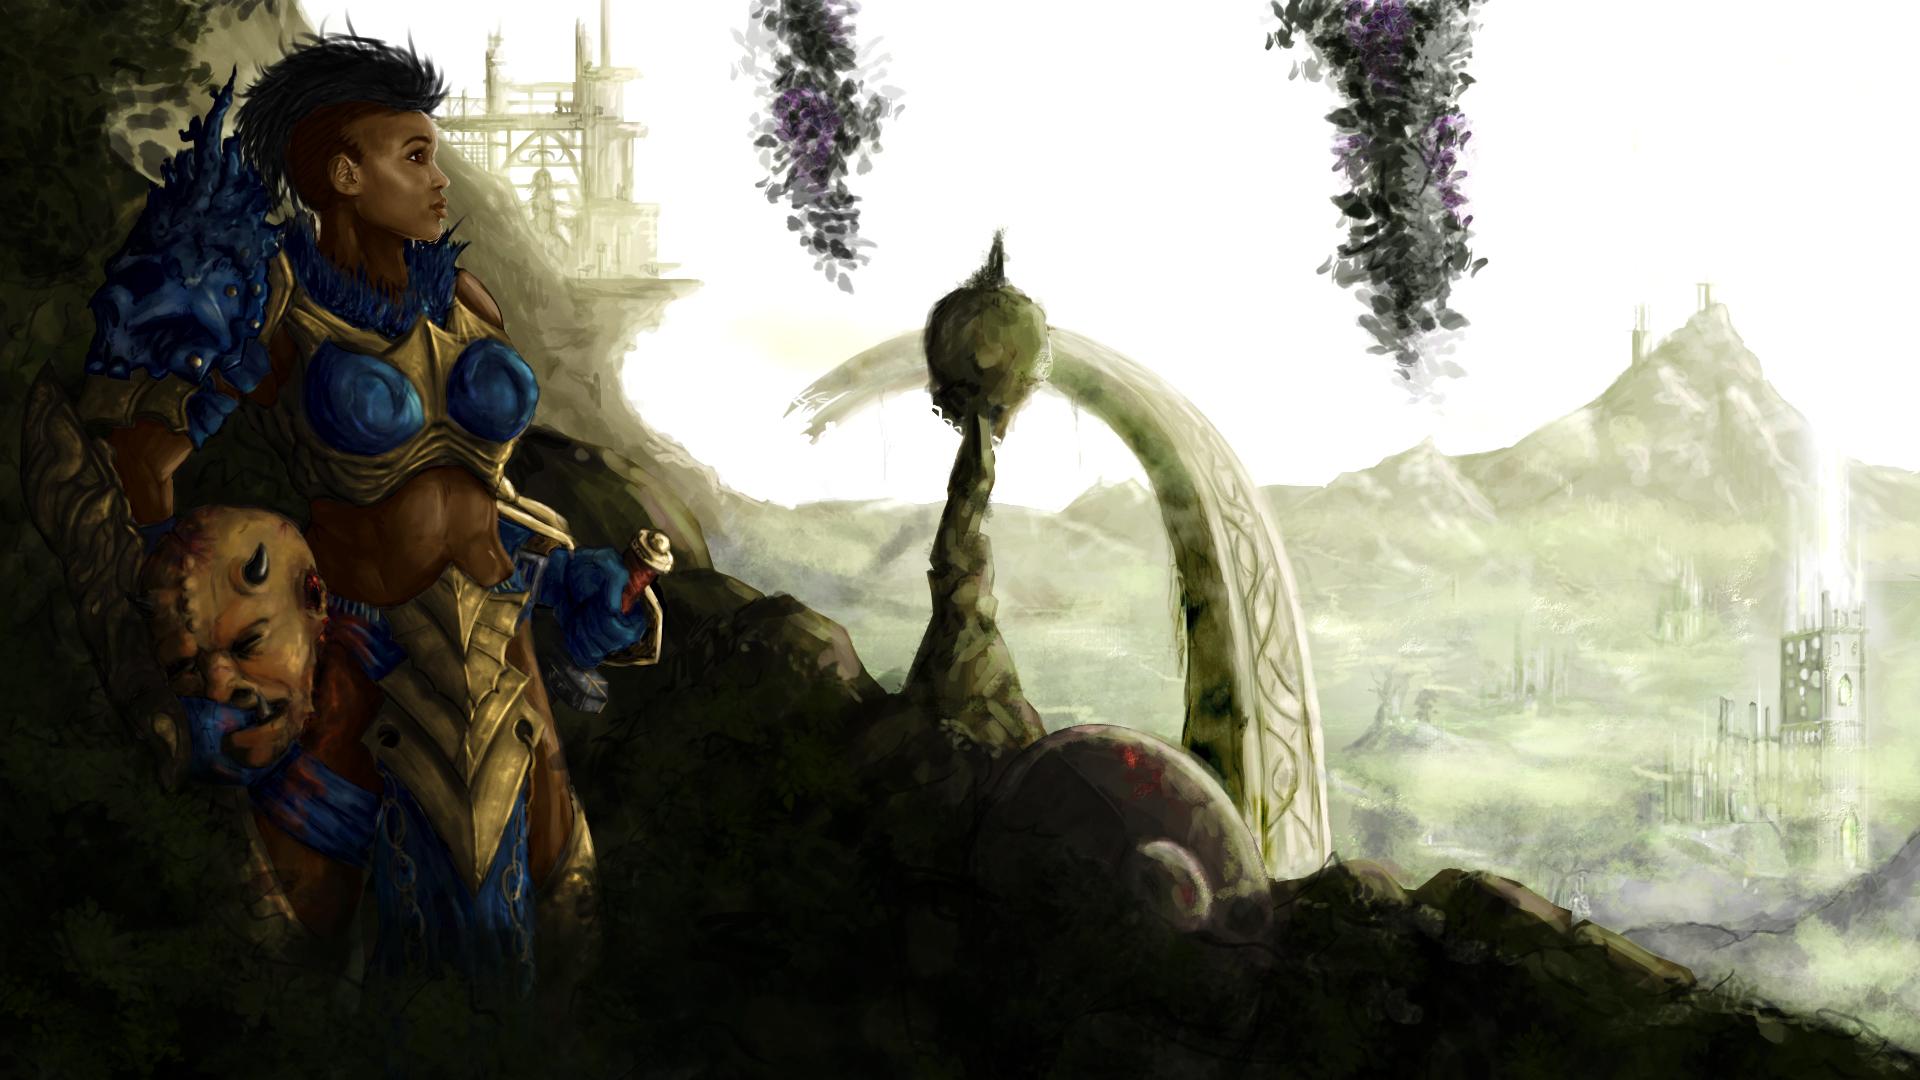 Human Warrior - Bounty Hunting - Guild Wars 2 Tumblr